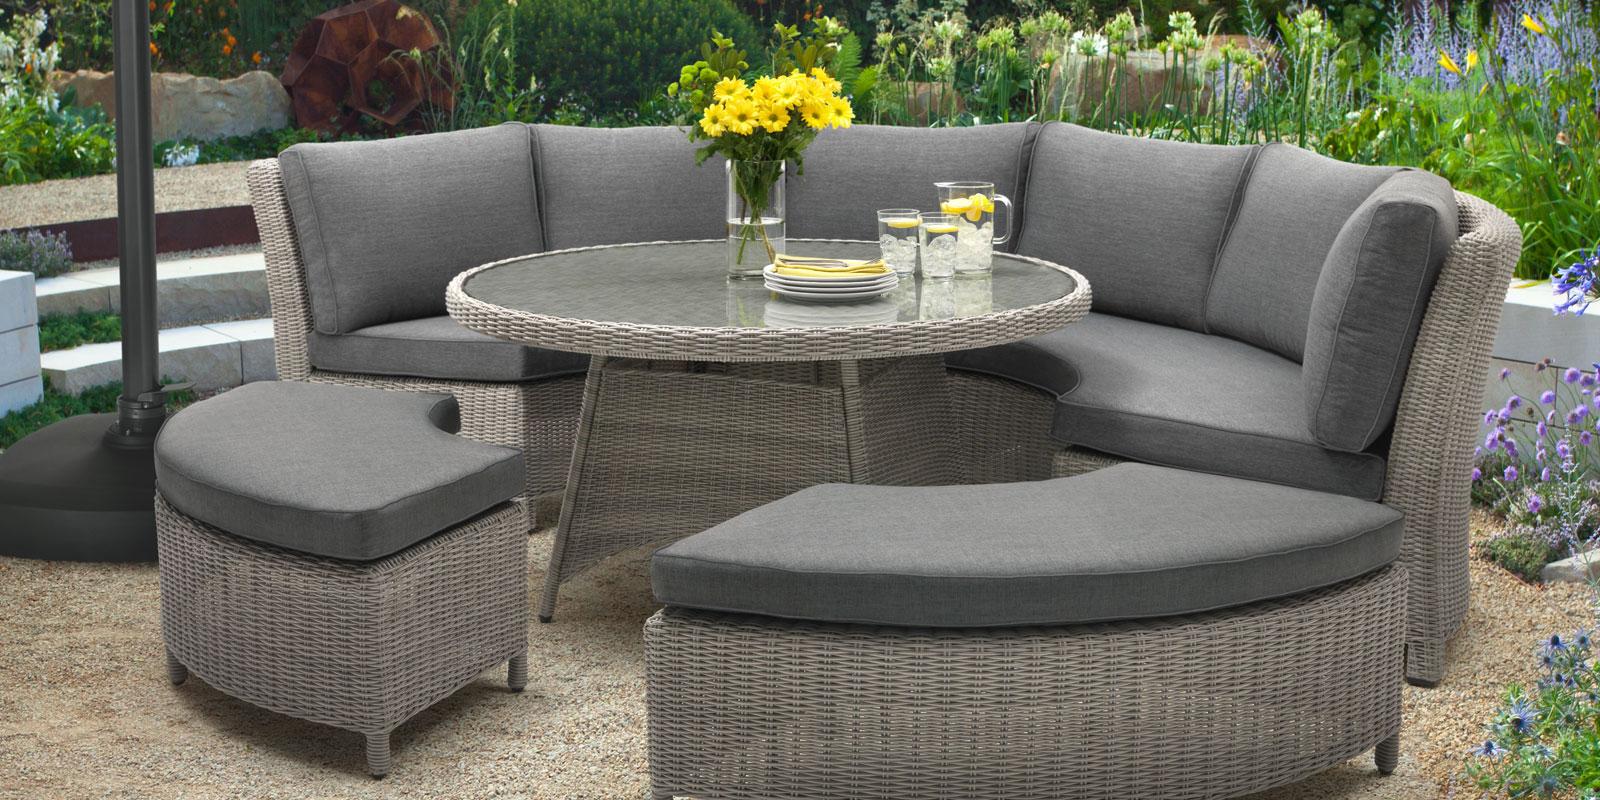 e1cde372bc3f Luxurious Garden Furniture From Kettler Trade Specialist. Henley Dining Set  ...